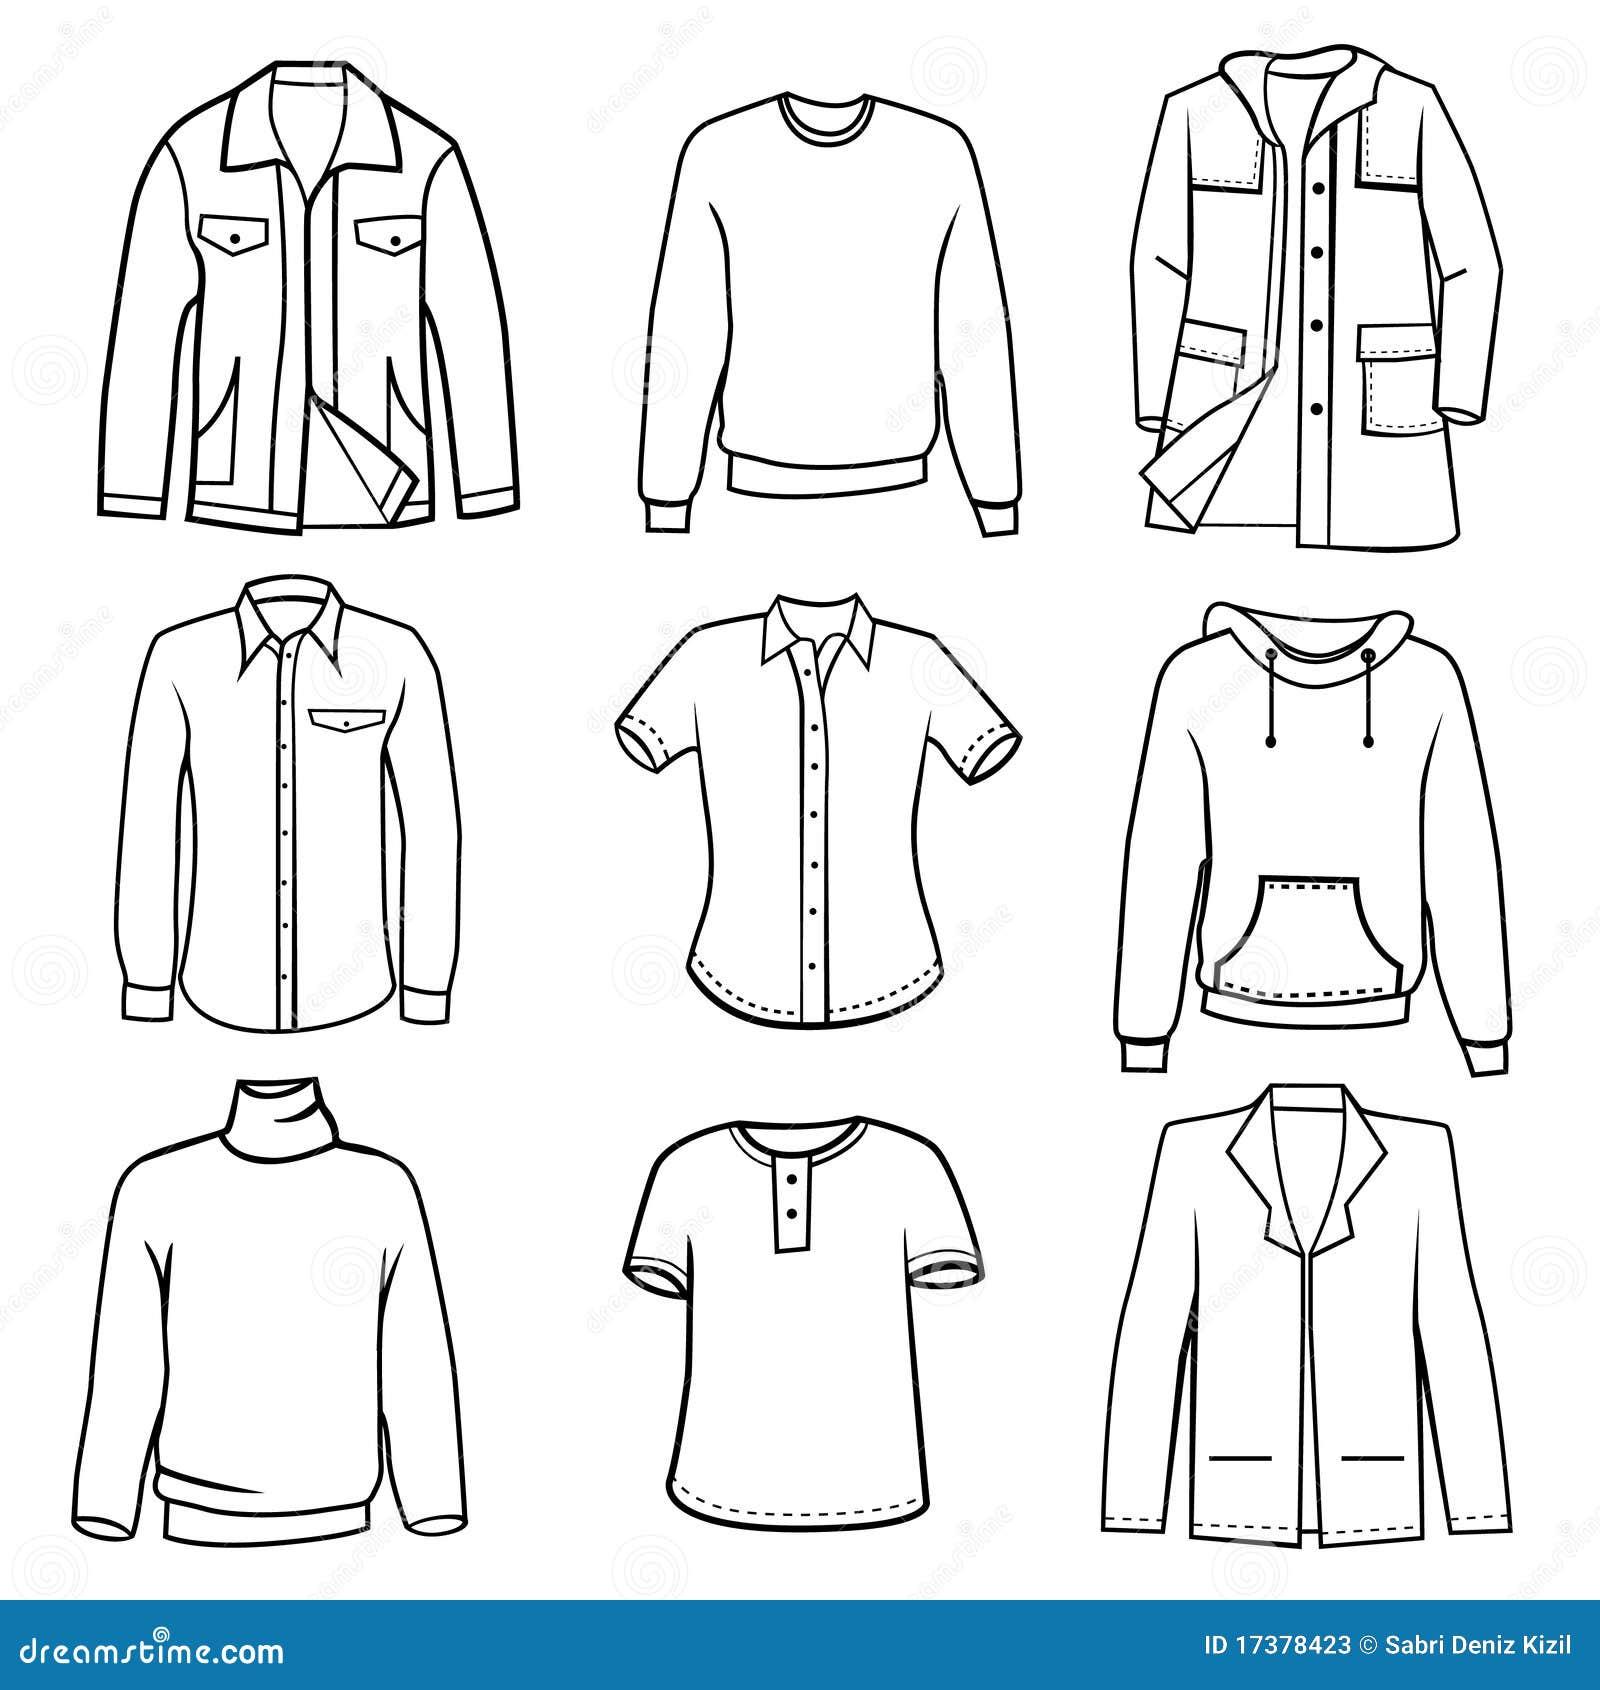 Printable Body Outline Fashion Design